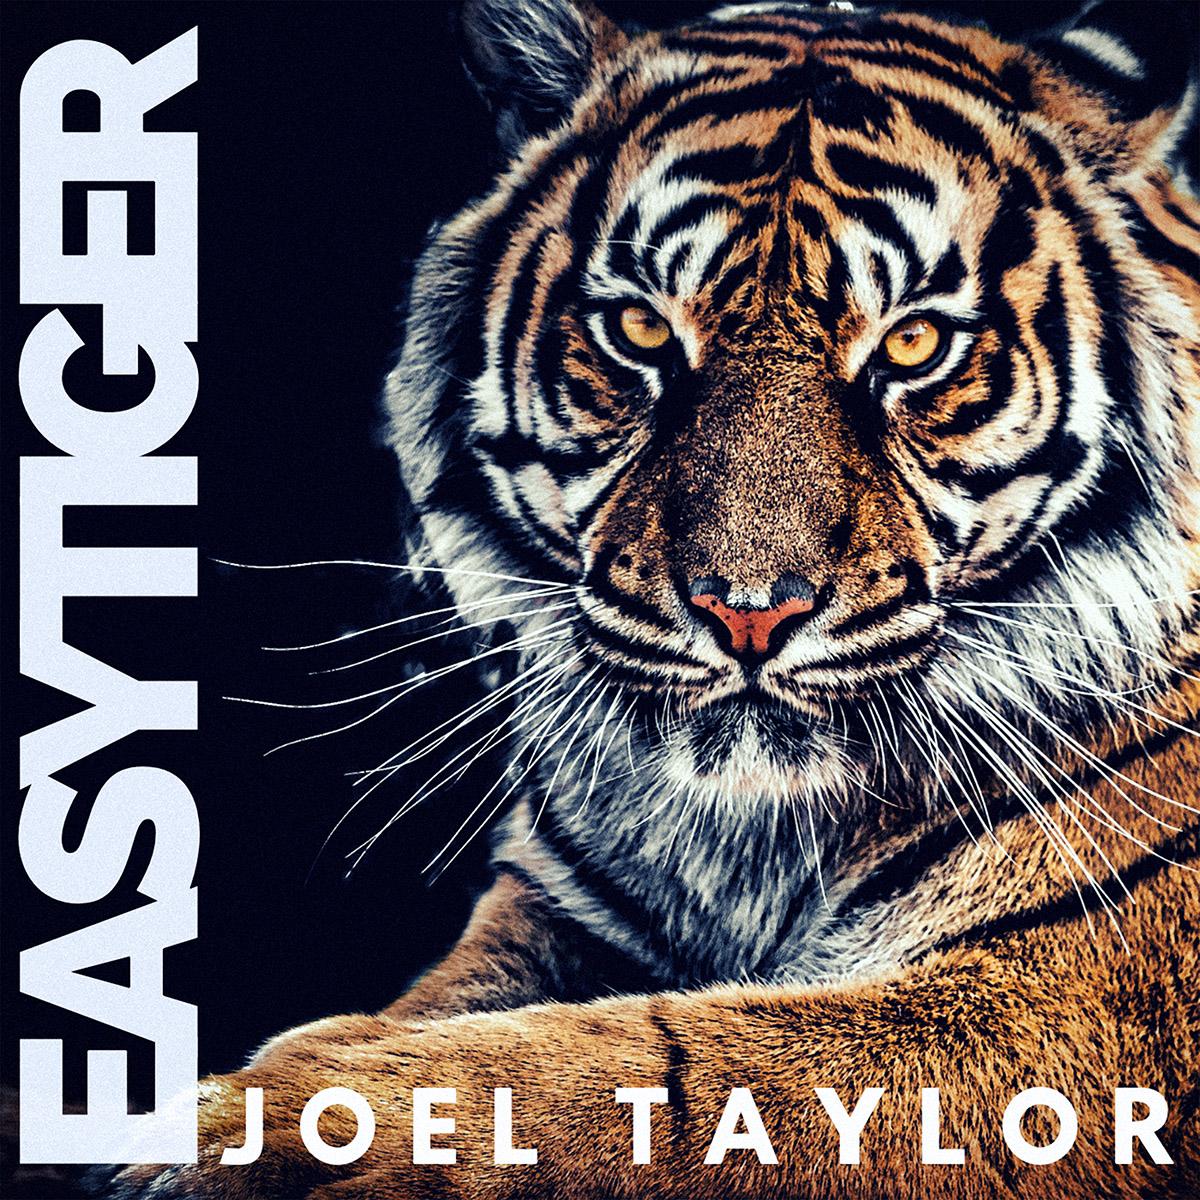 EASY TIGER - sm.jpg